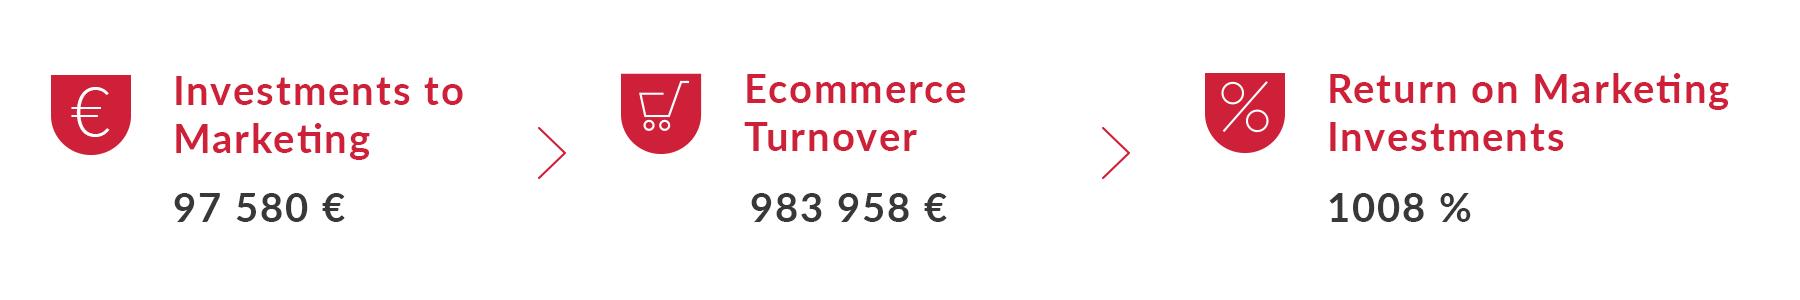 Case Study Ecommerce Return of Marketing Investments